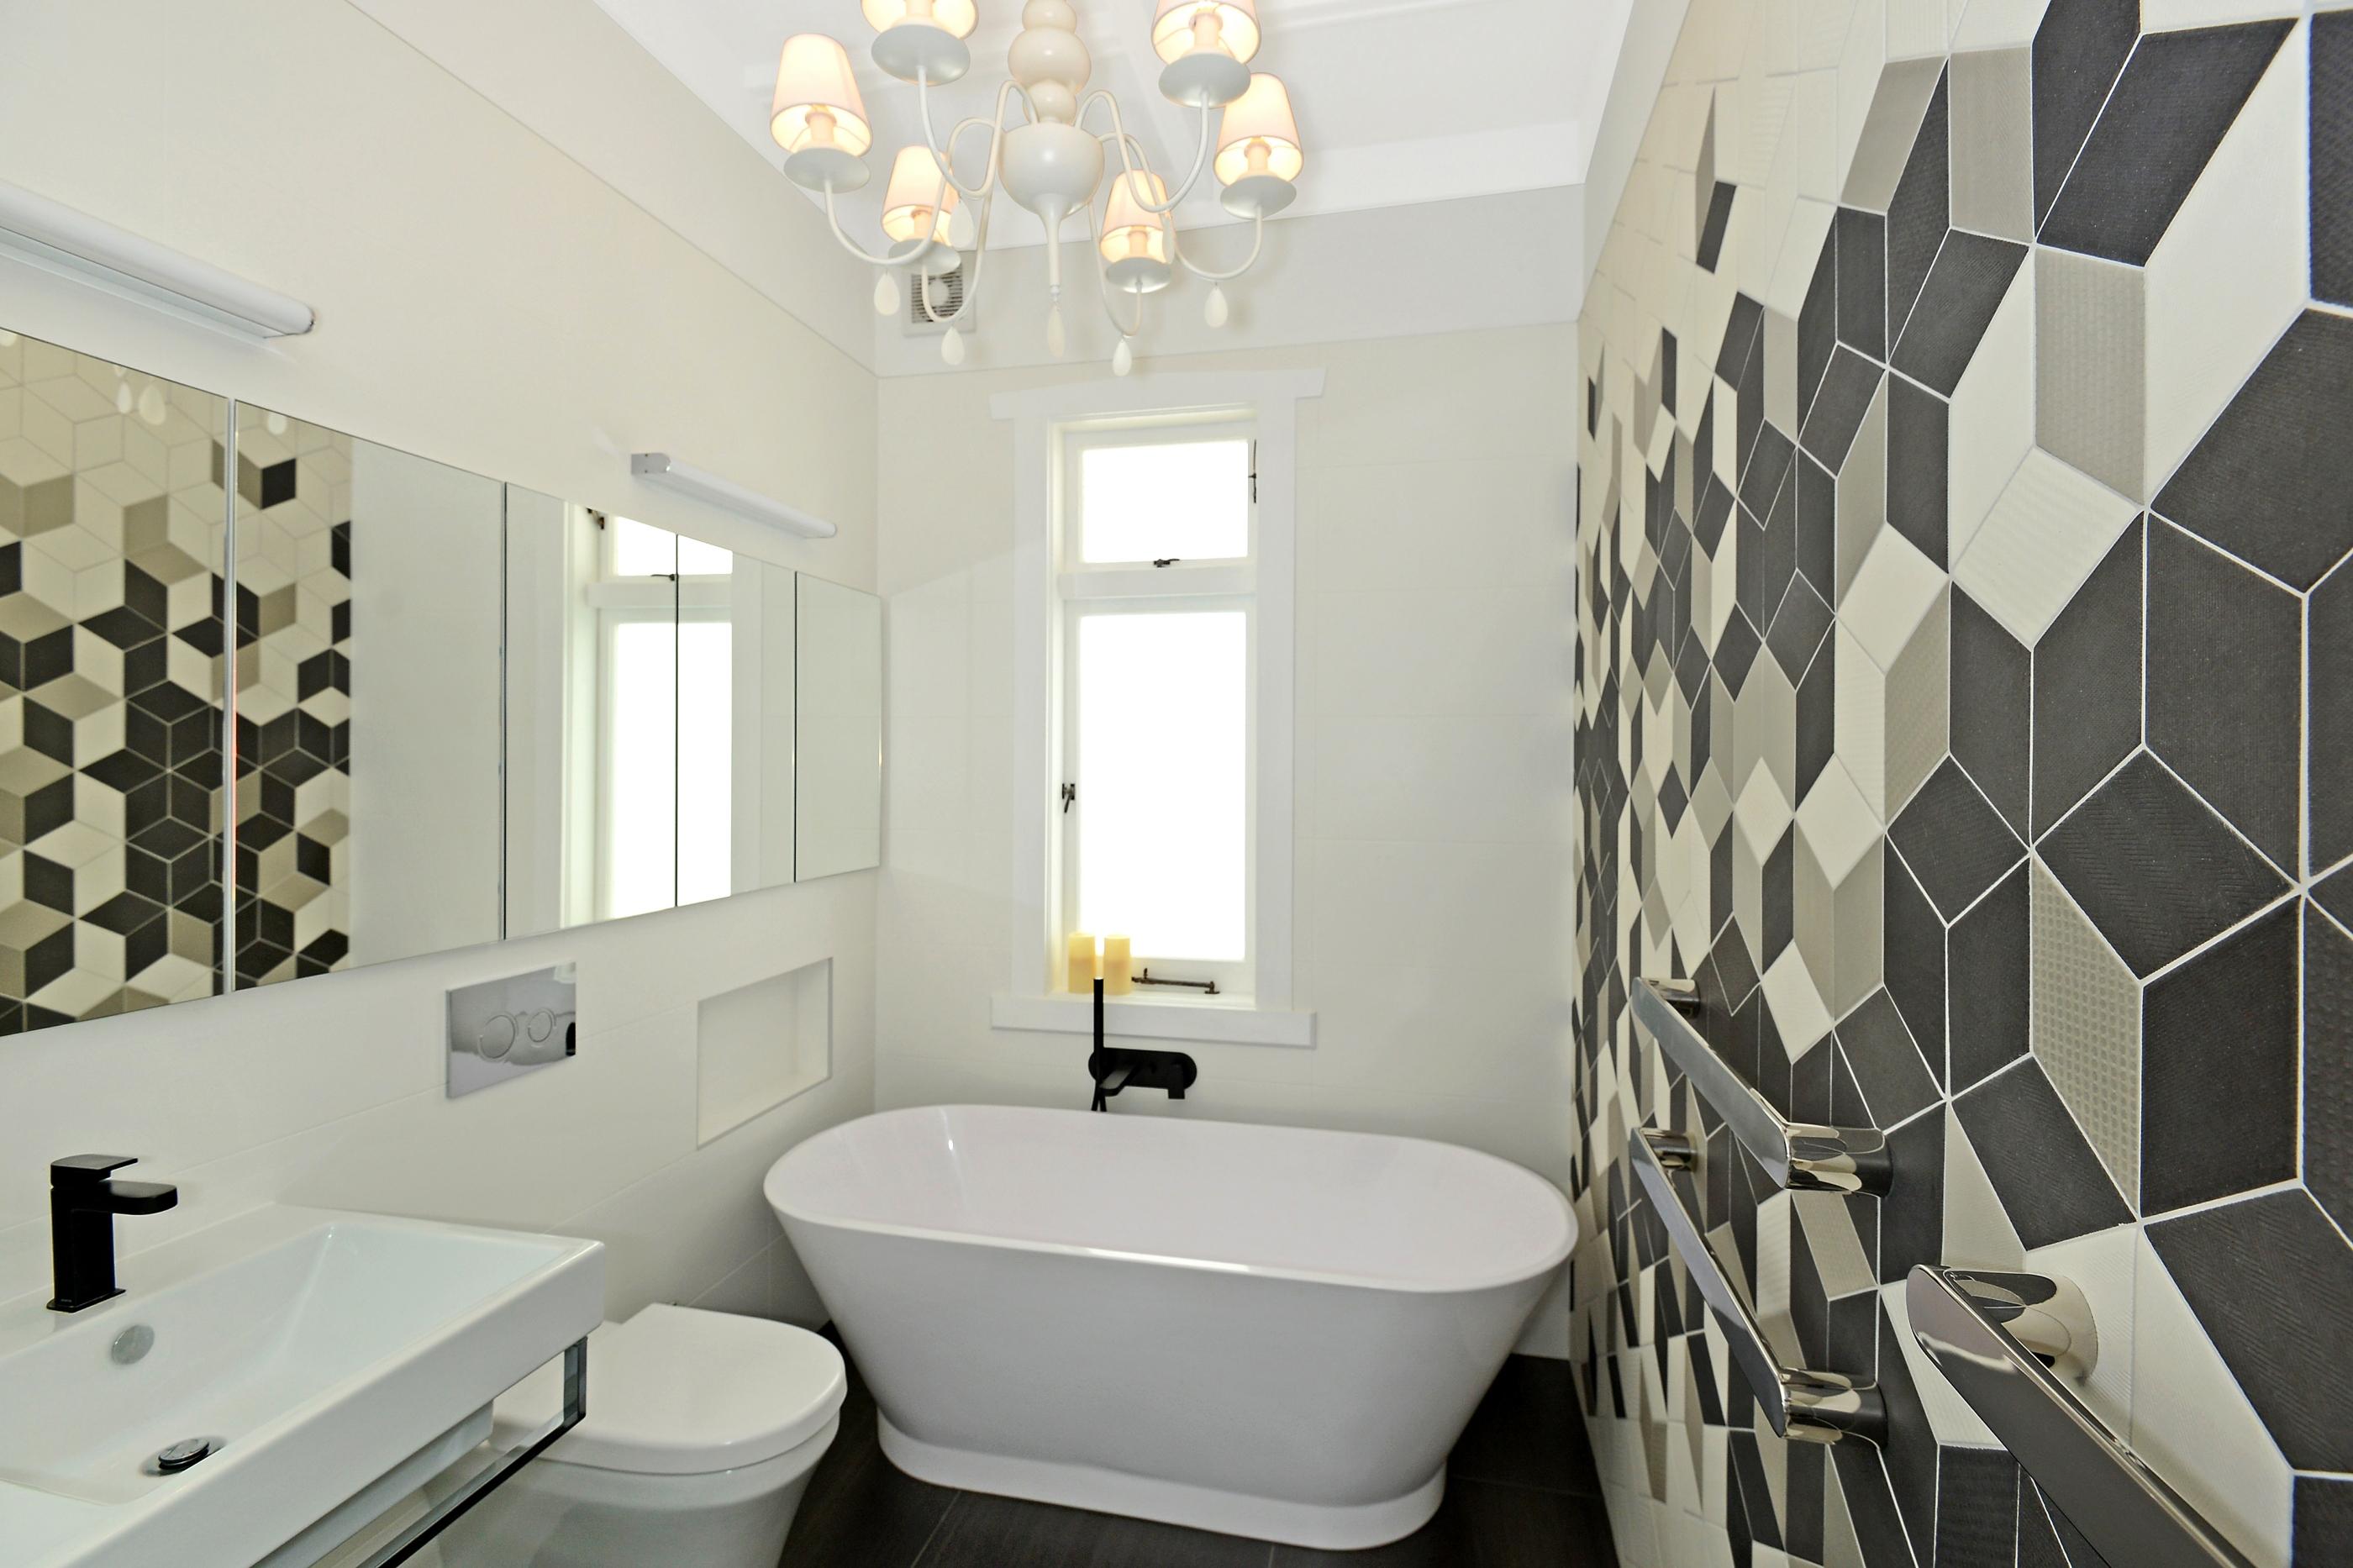 Bathroom tiles dunedin nz welcome landreth luxury sea girt home bathroom tiles dunedin nz european ceramics design gallery dailygadgetfo Images